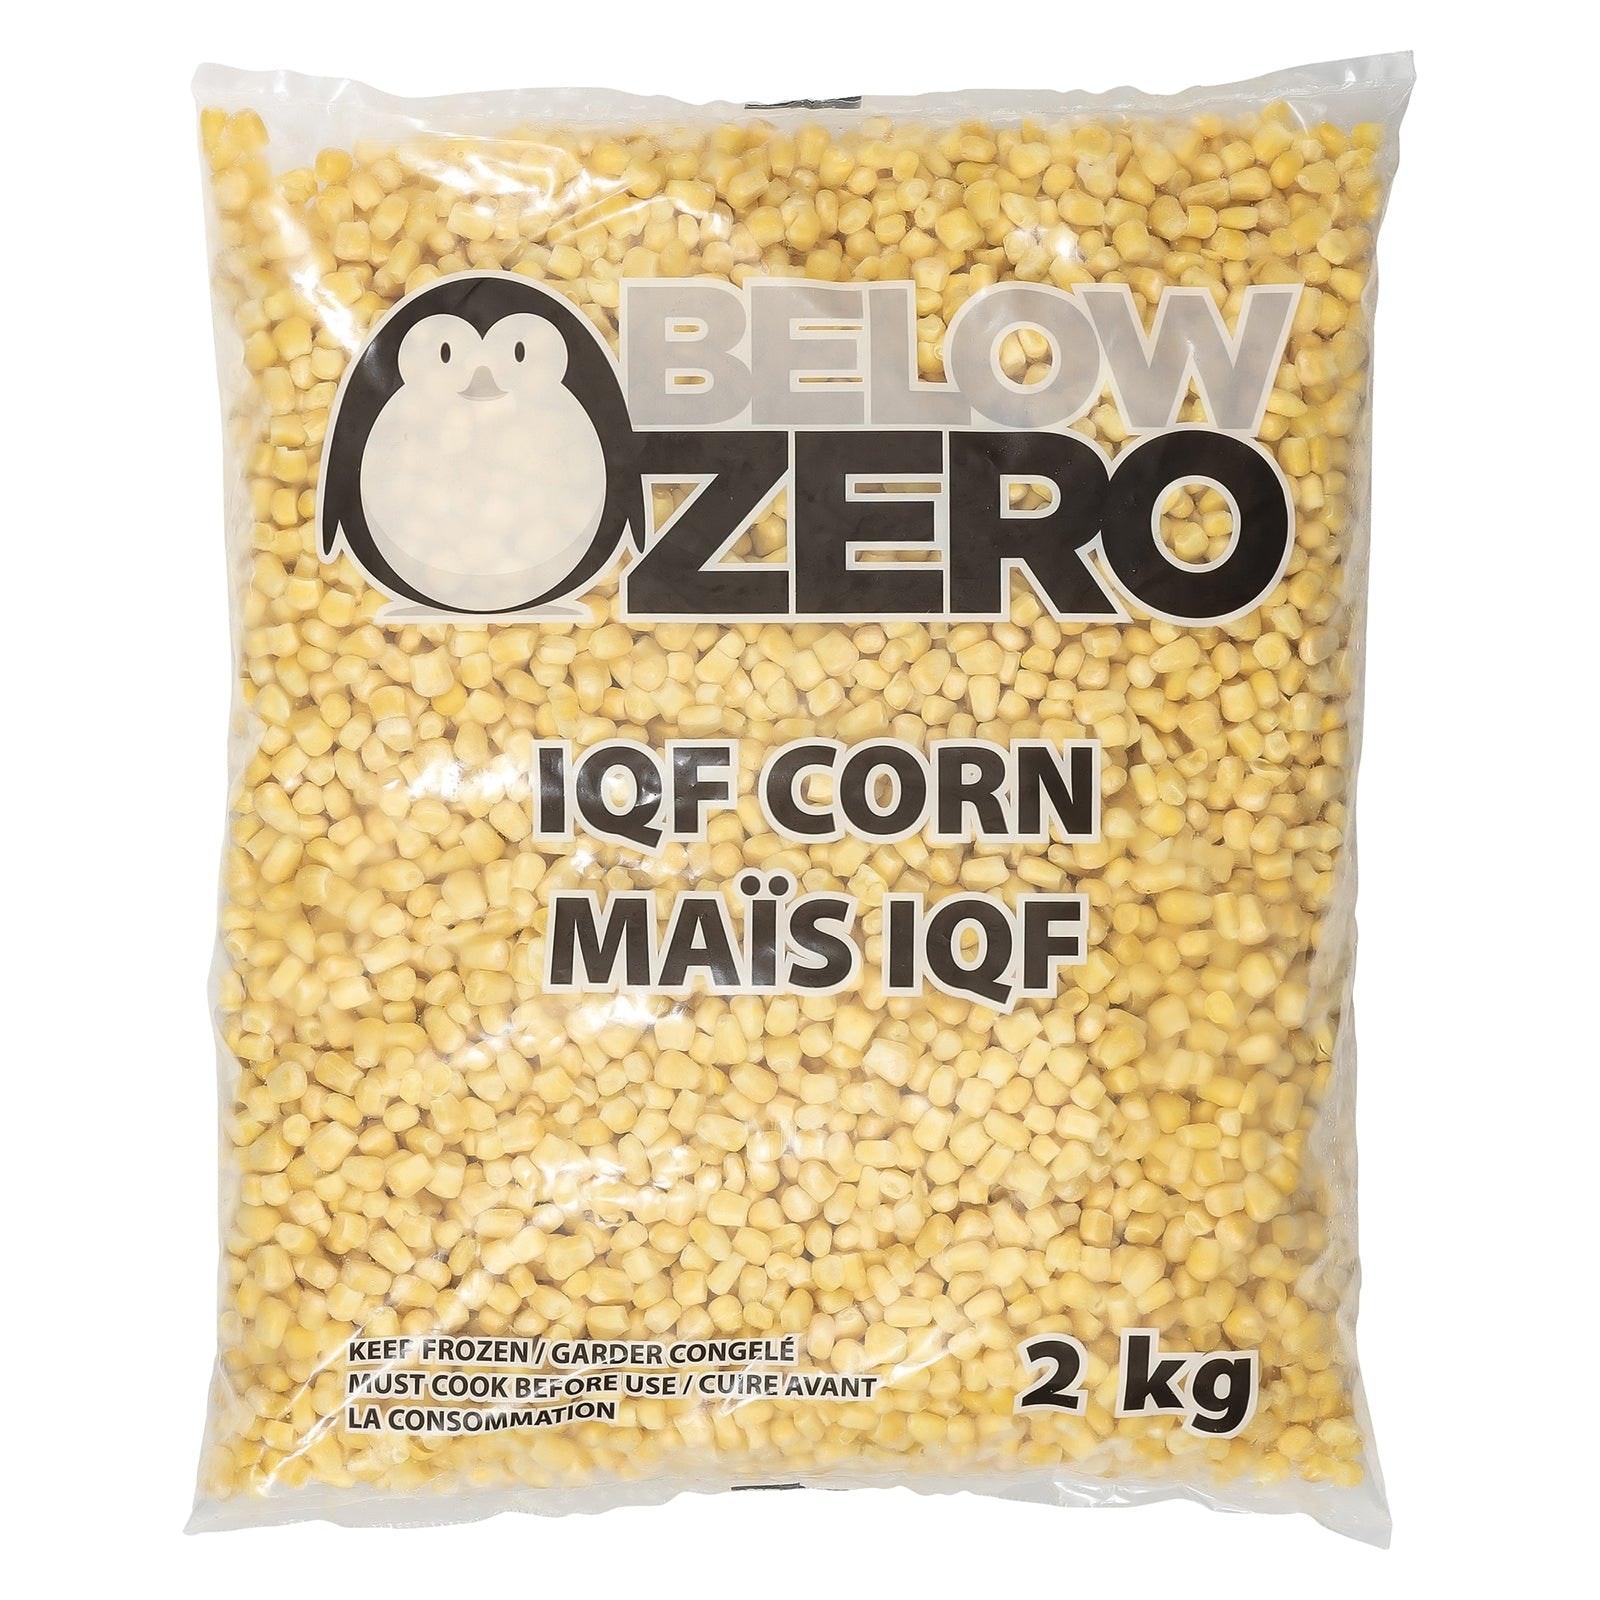 BELOW ZERO Corn